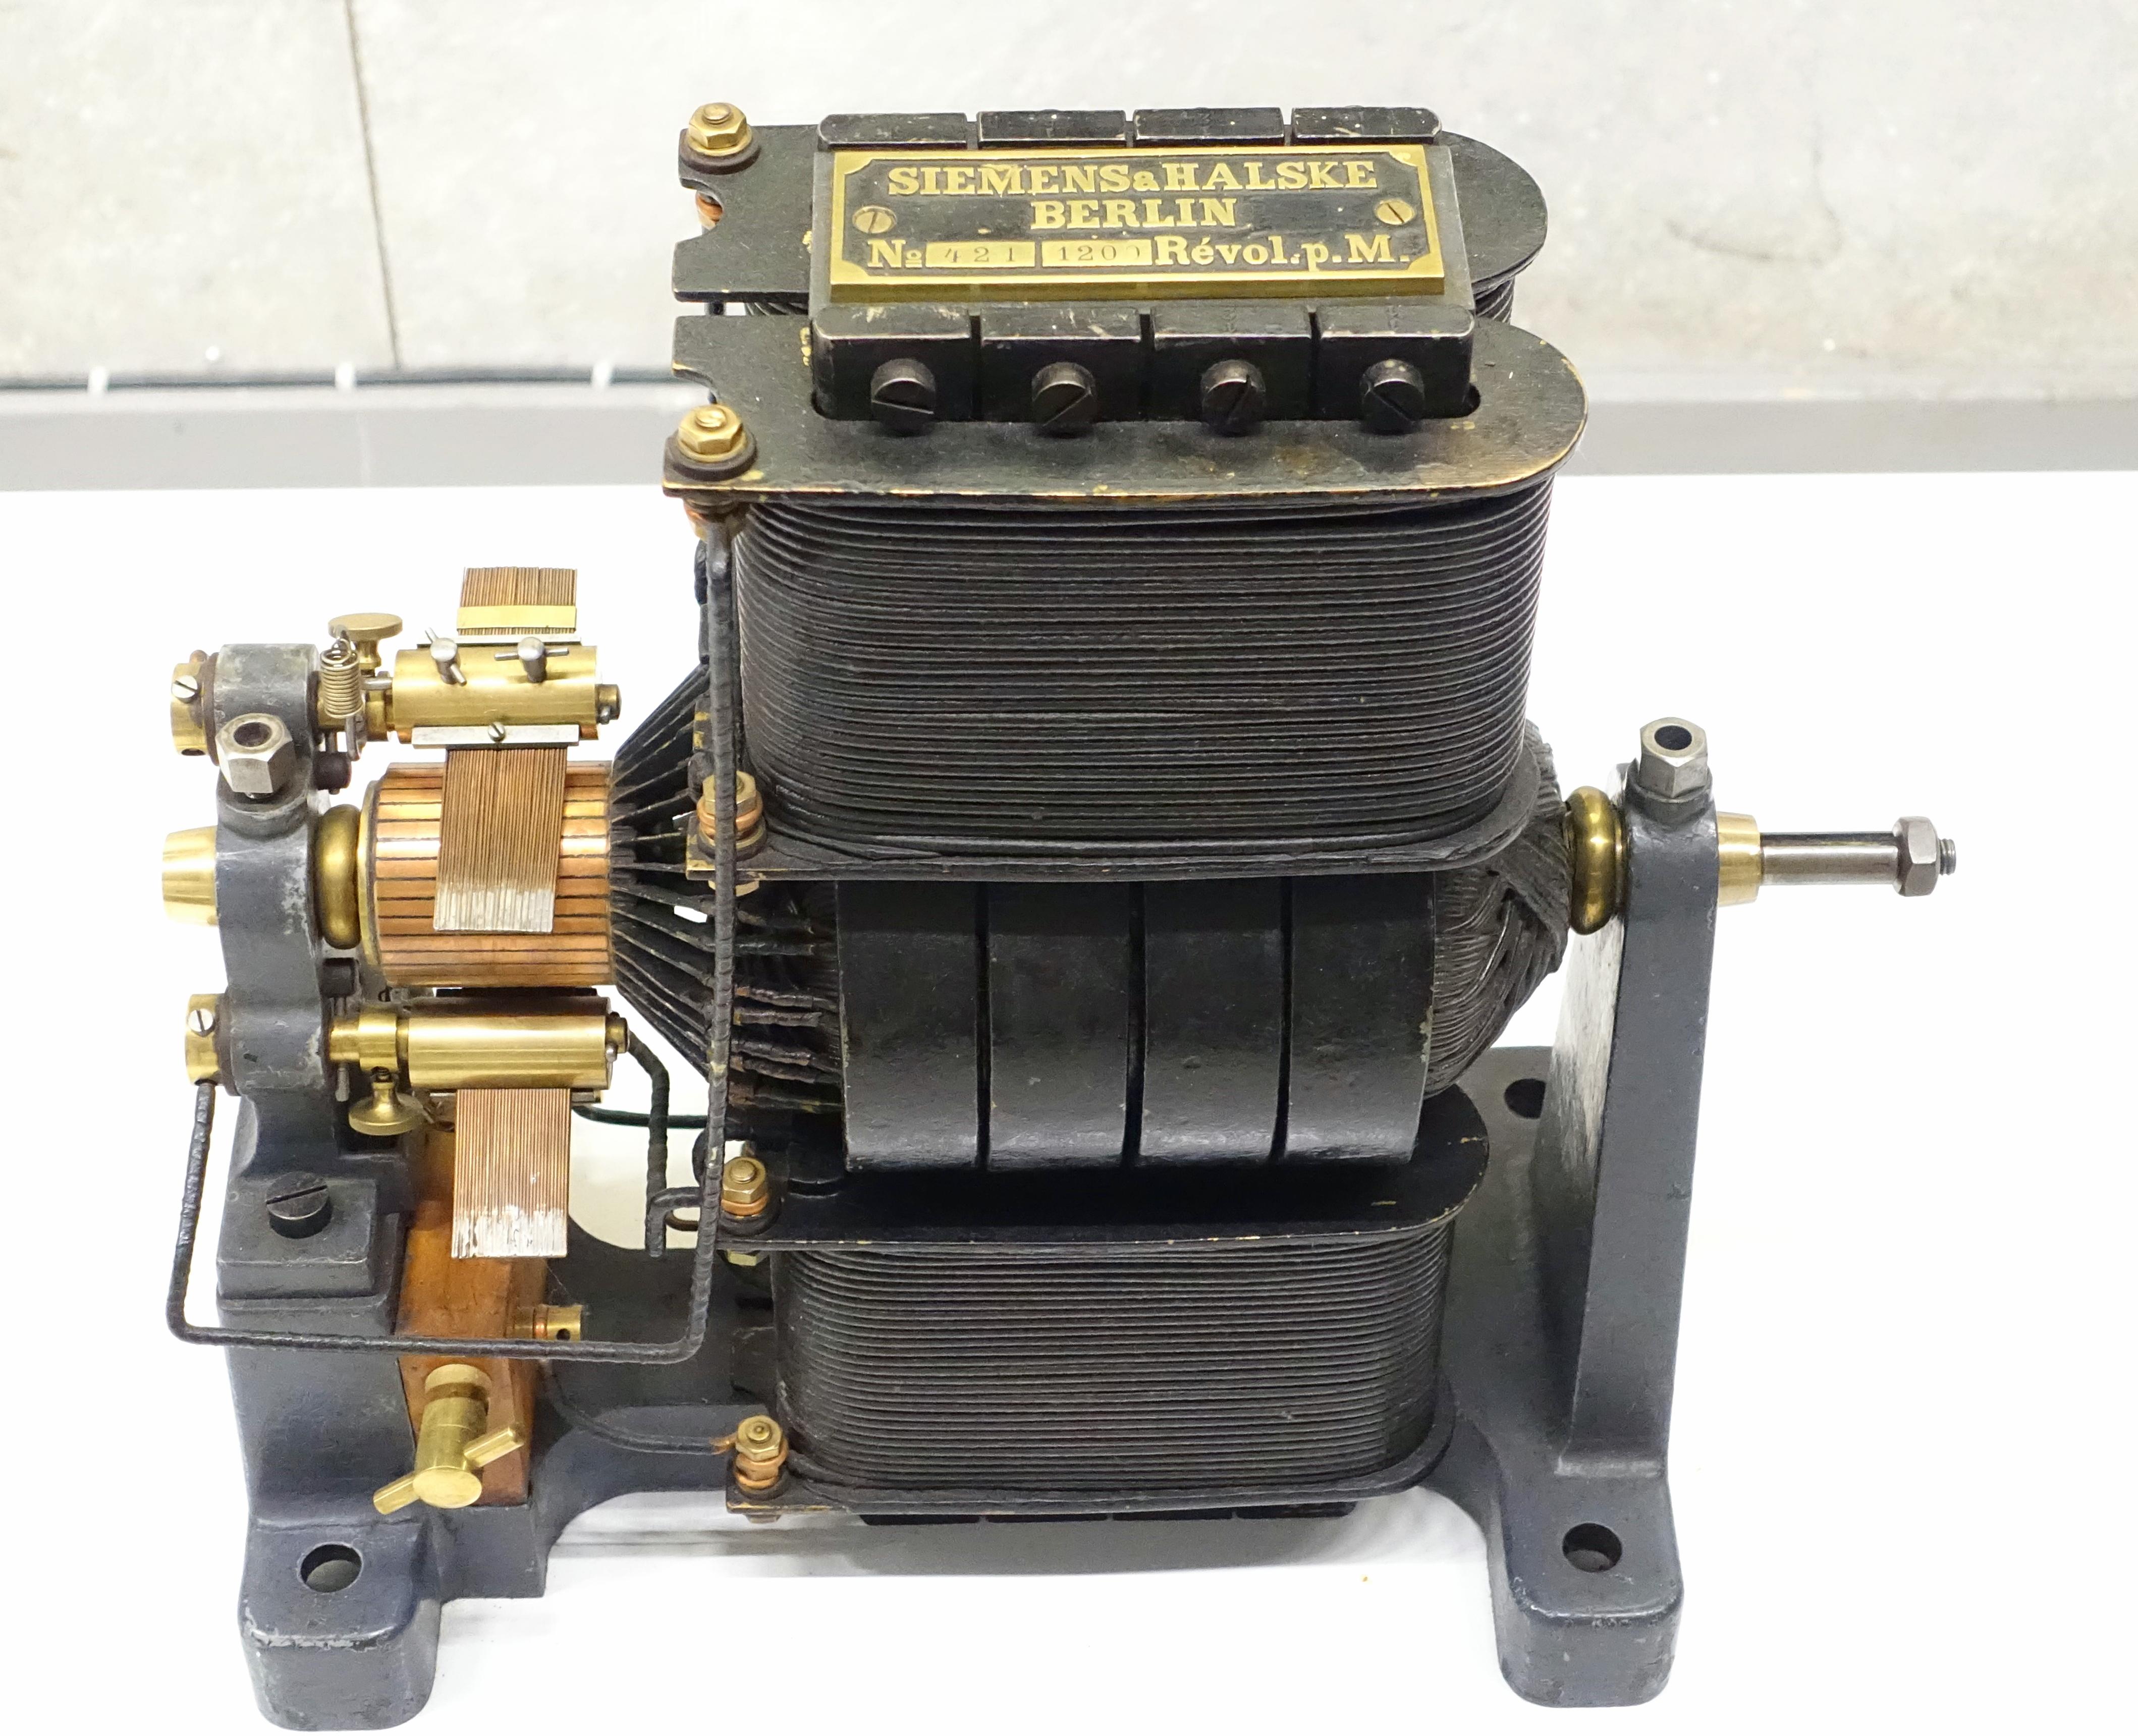 filedirect current generator siemens amp halske 1882